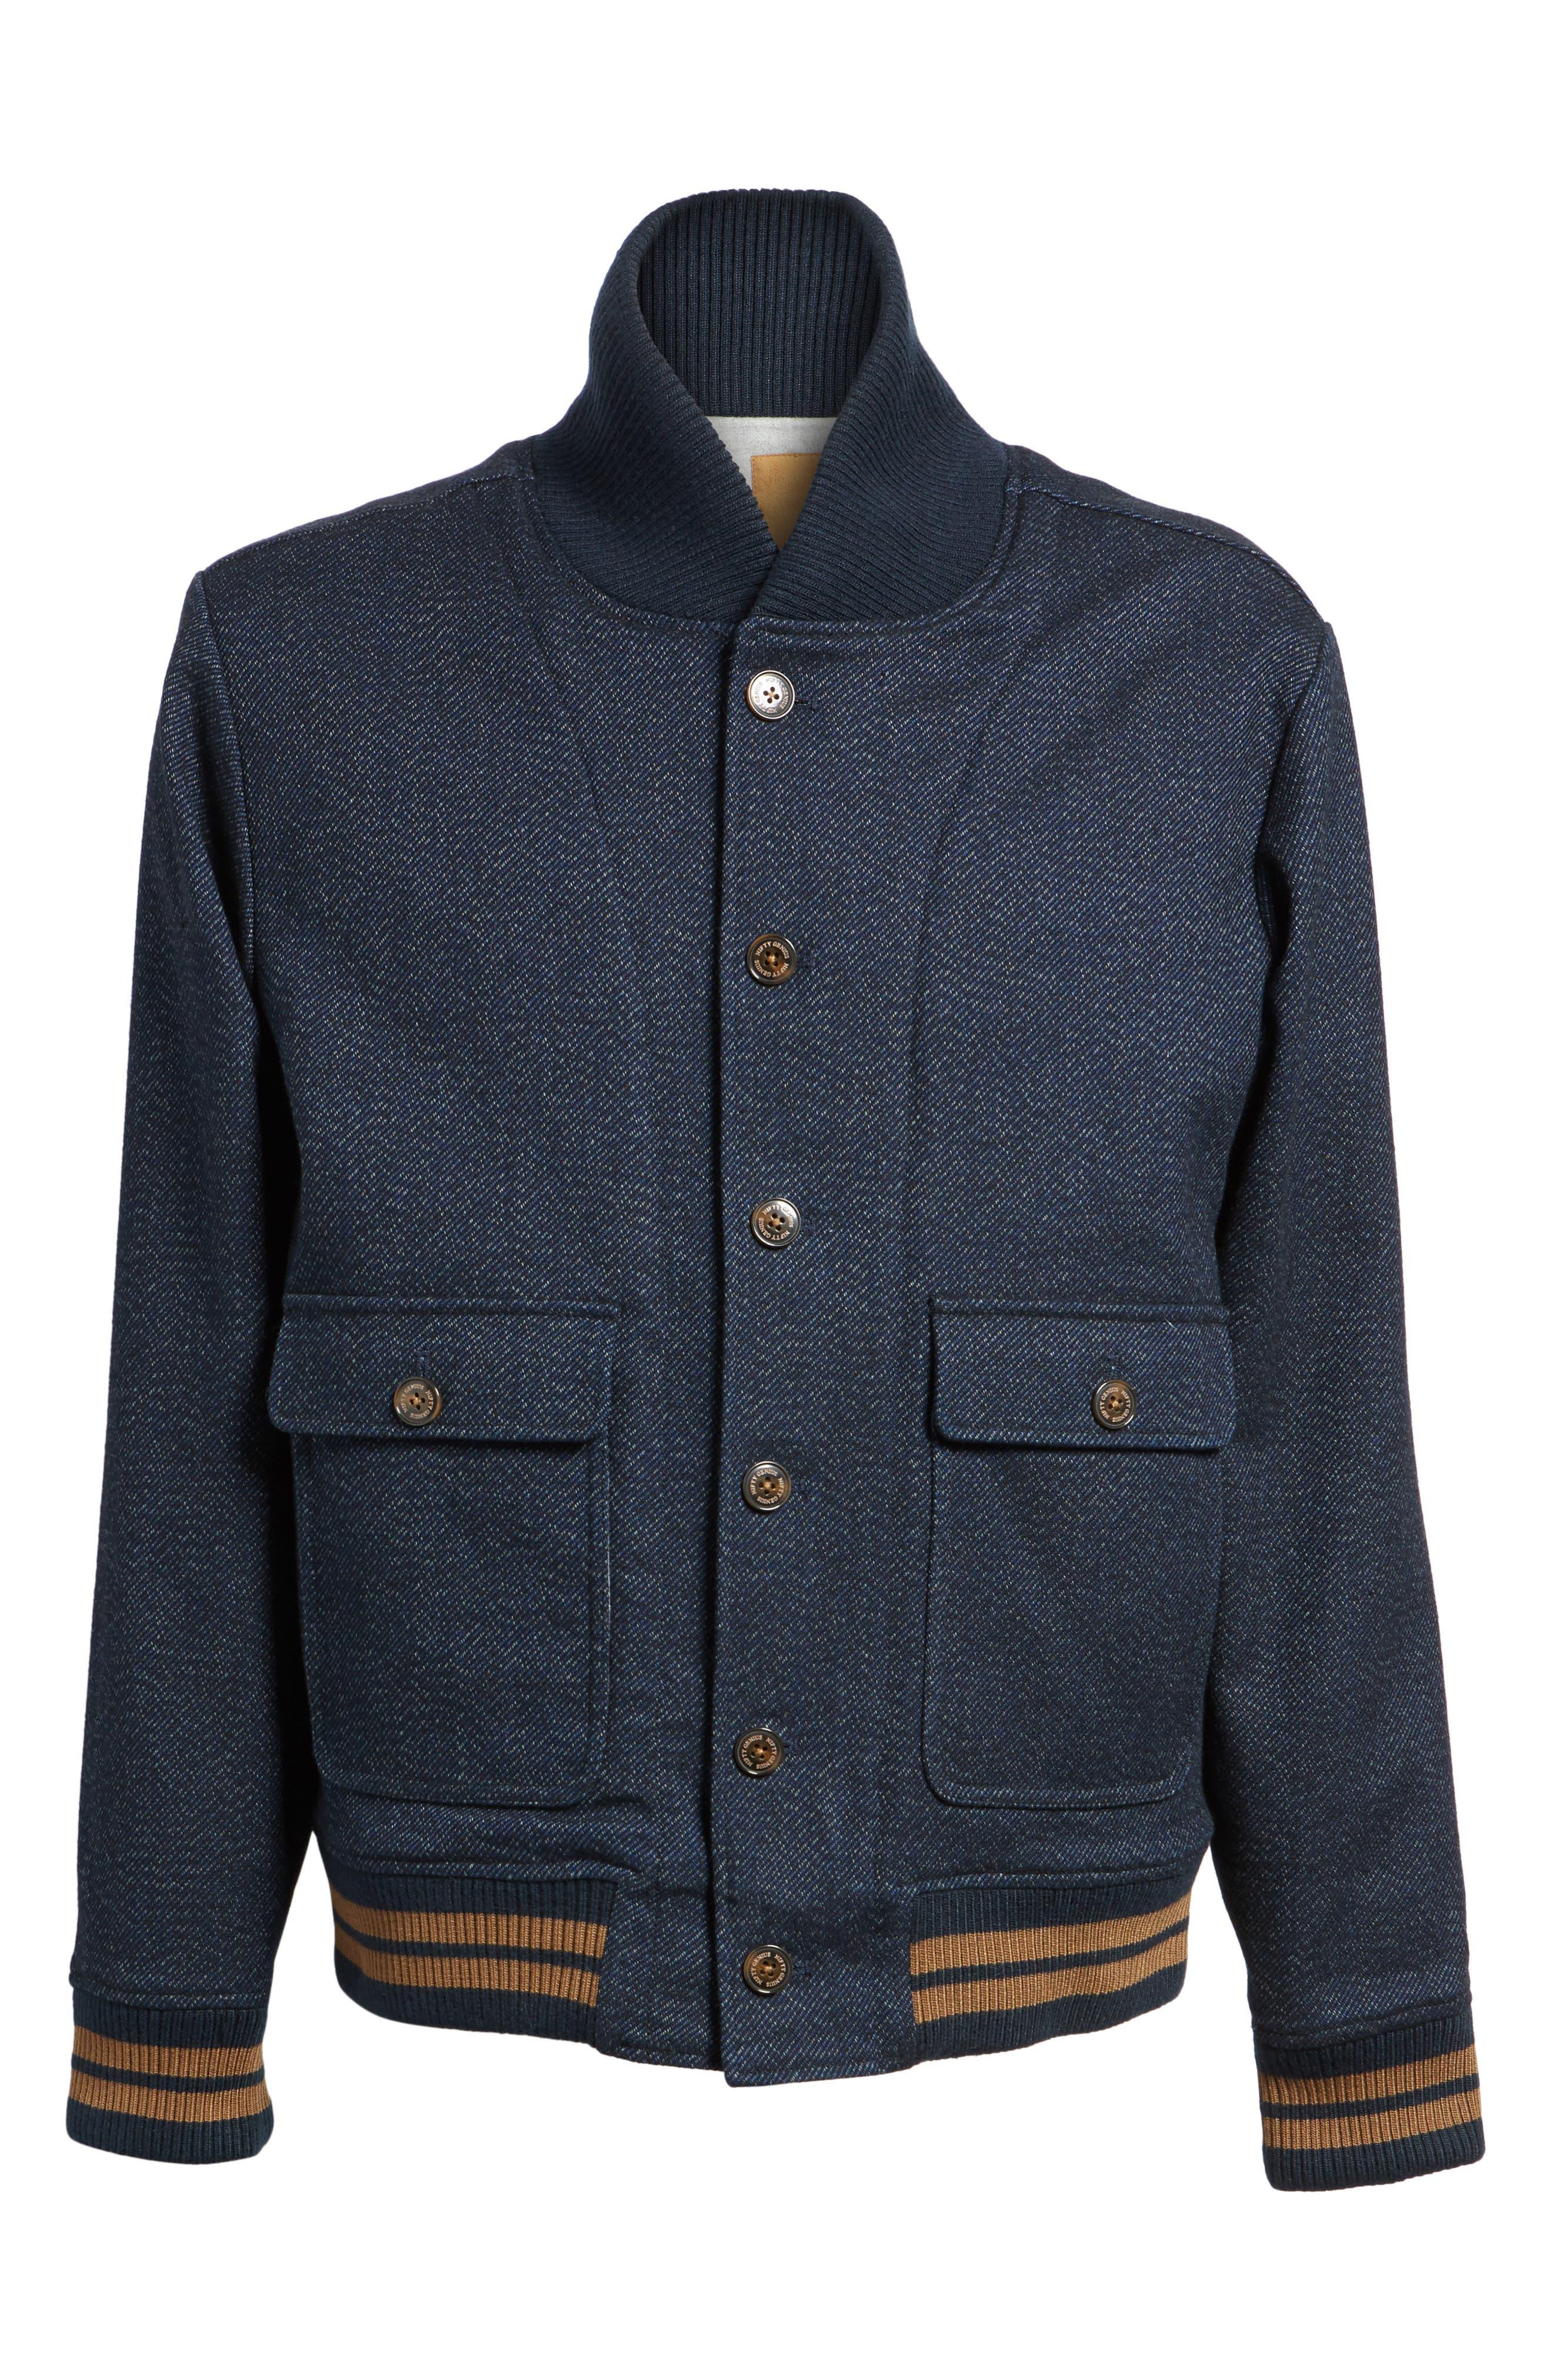 Roll Collar Varsity Jacket,                             Alternate thumbnail 6, color,                             Indigo